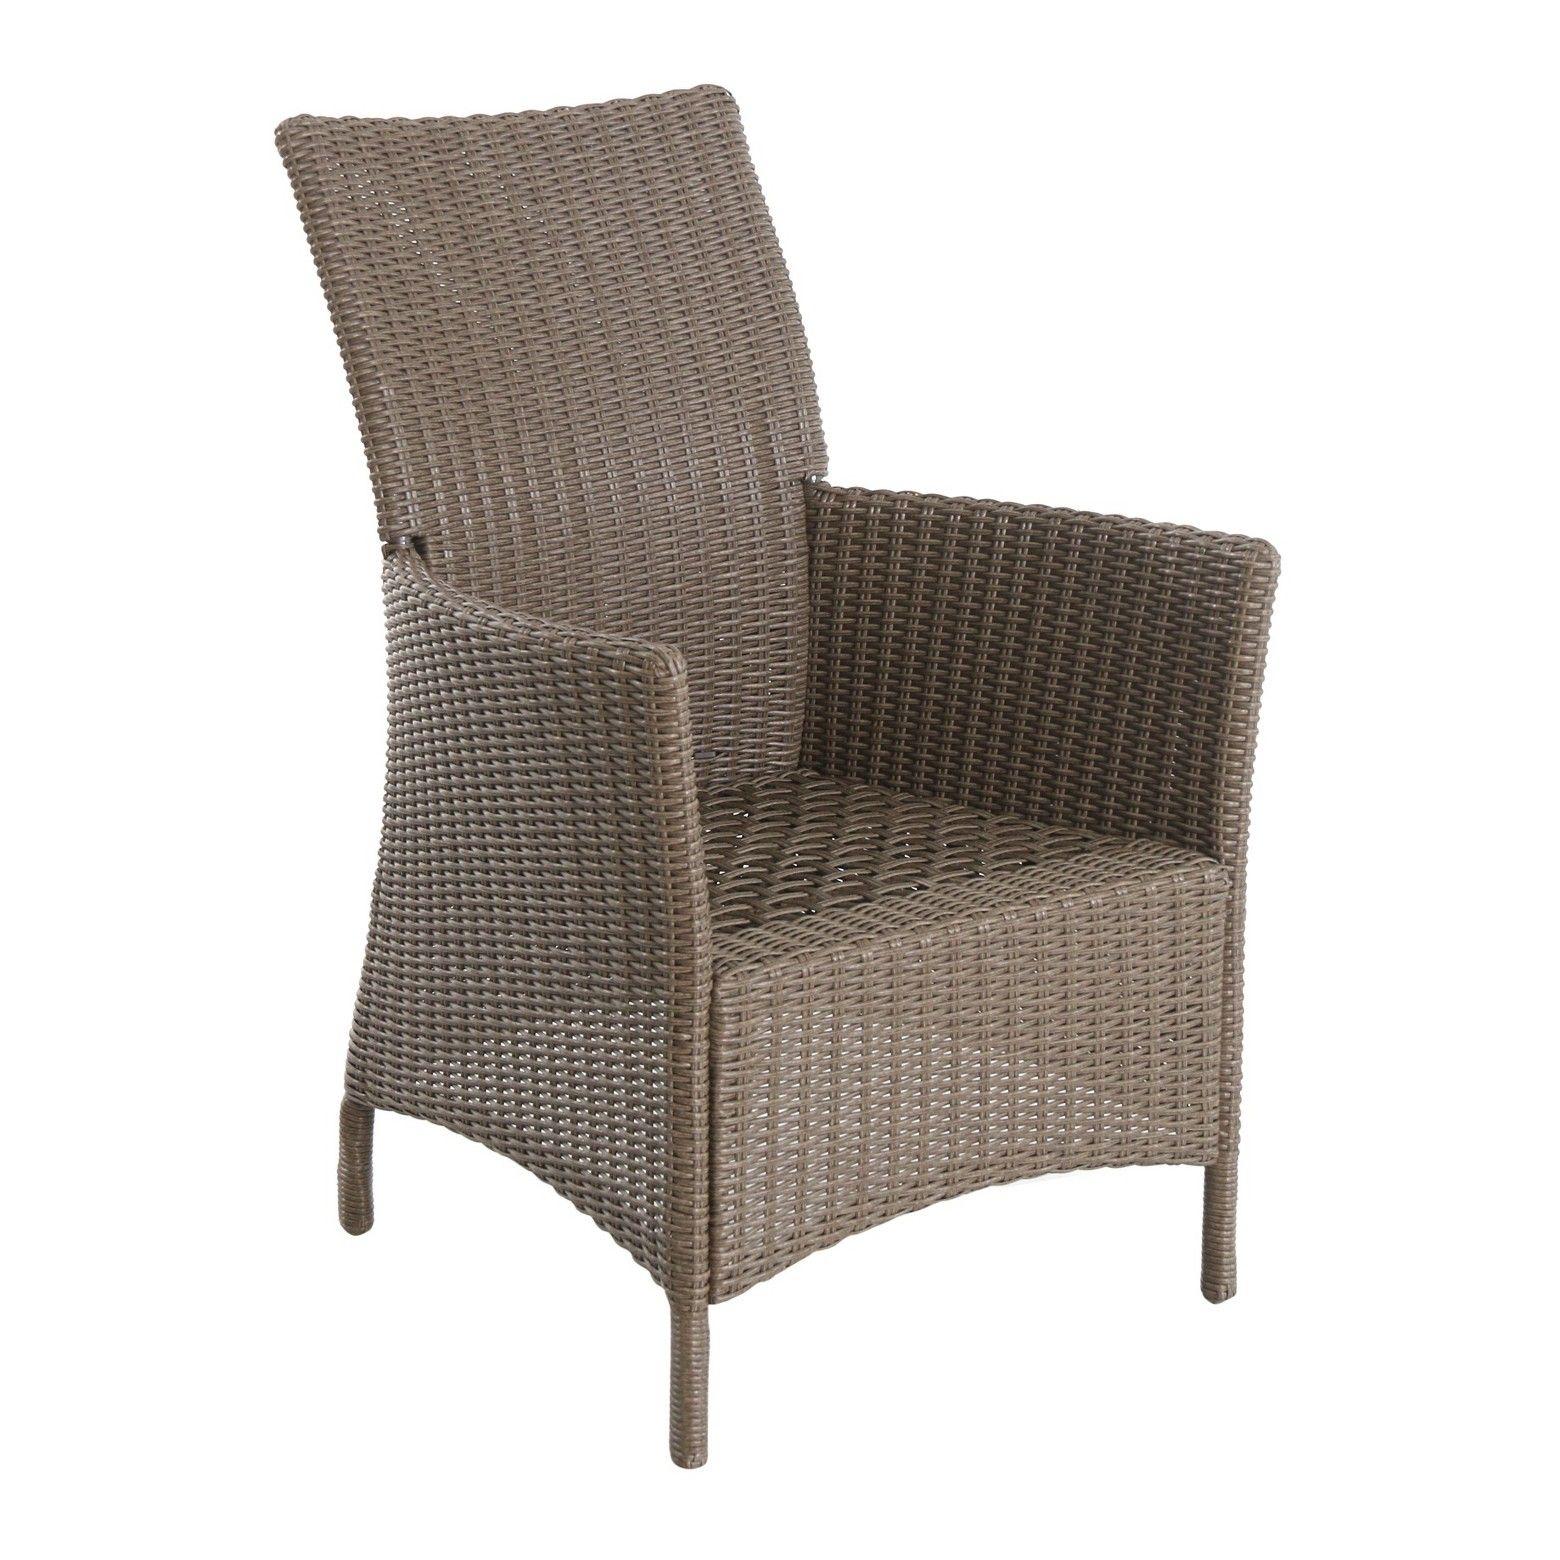 Heatherstone 6pk Wicker Patio Dining Chair Frame ly